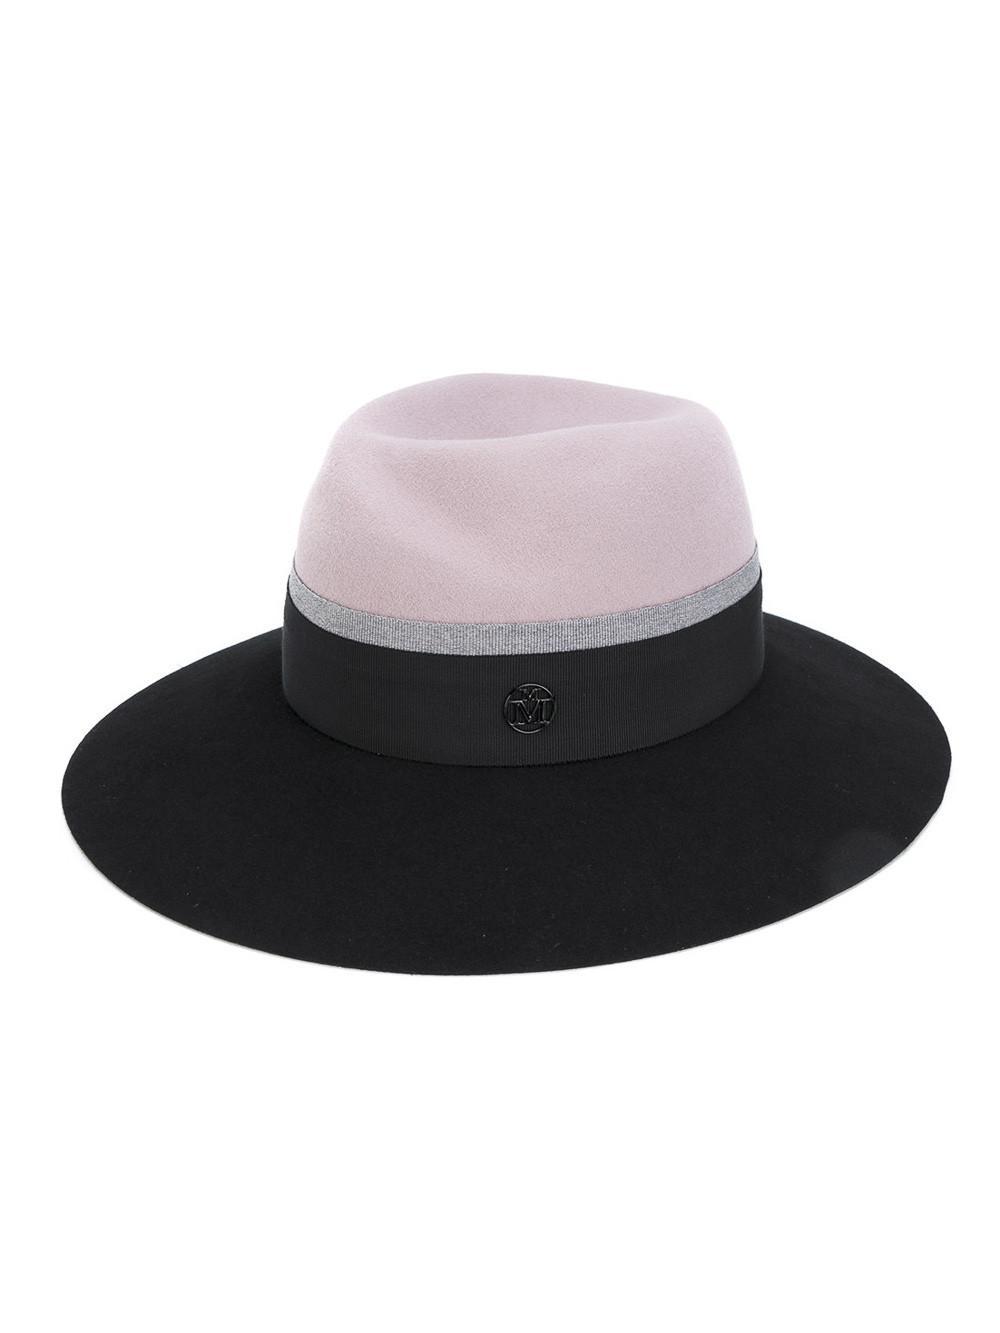 Maison Michel Henrietta Felt 女士毛毡帽子